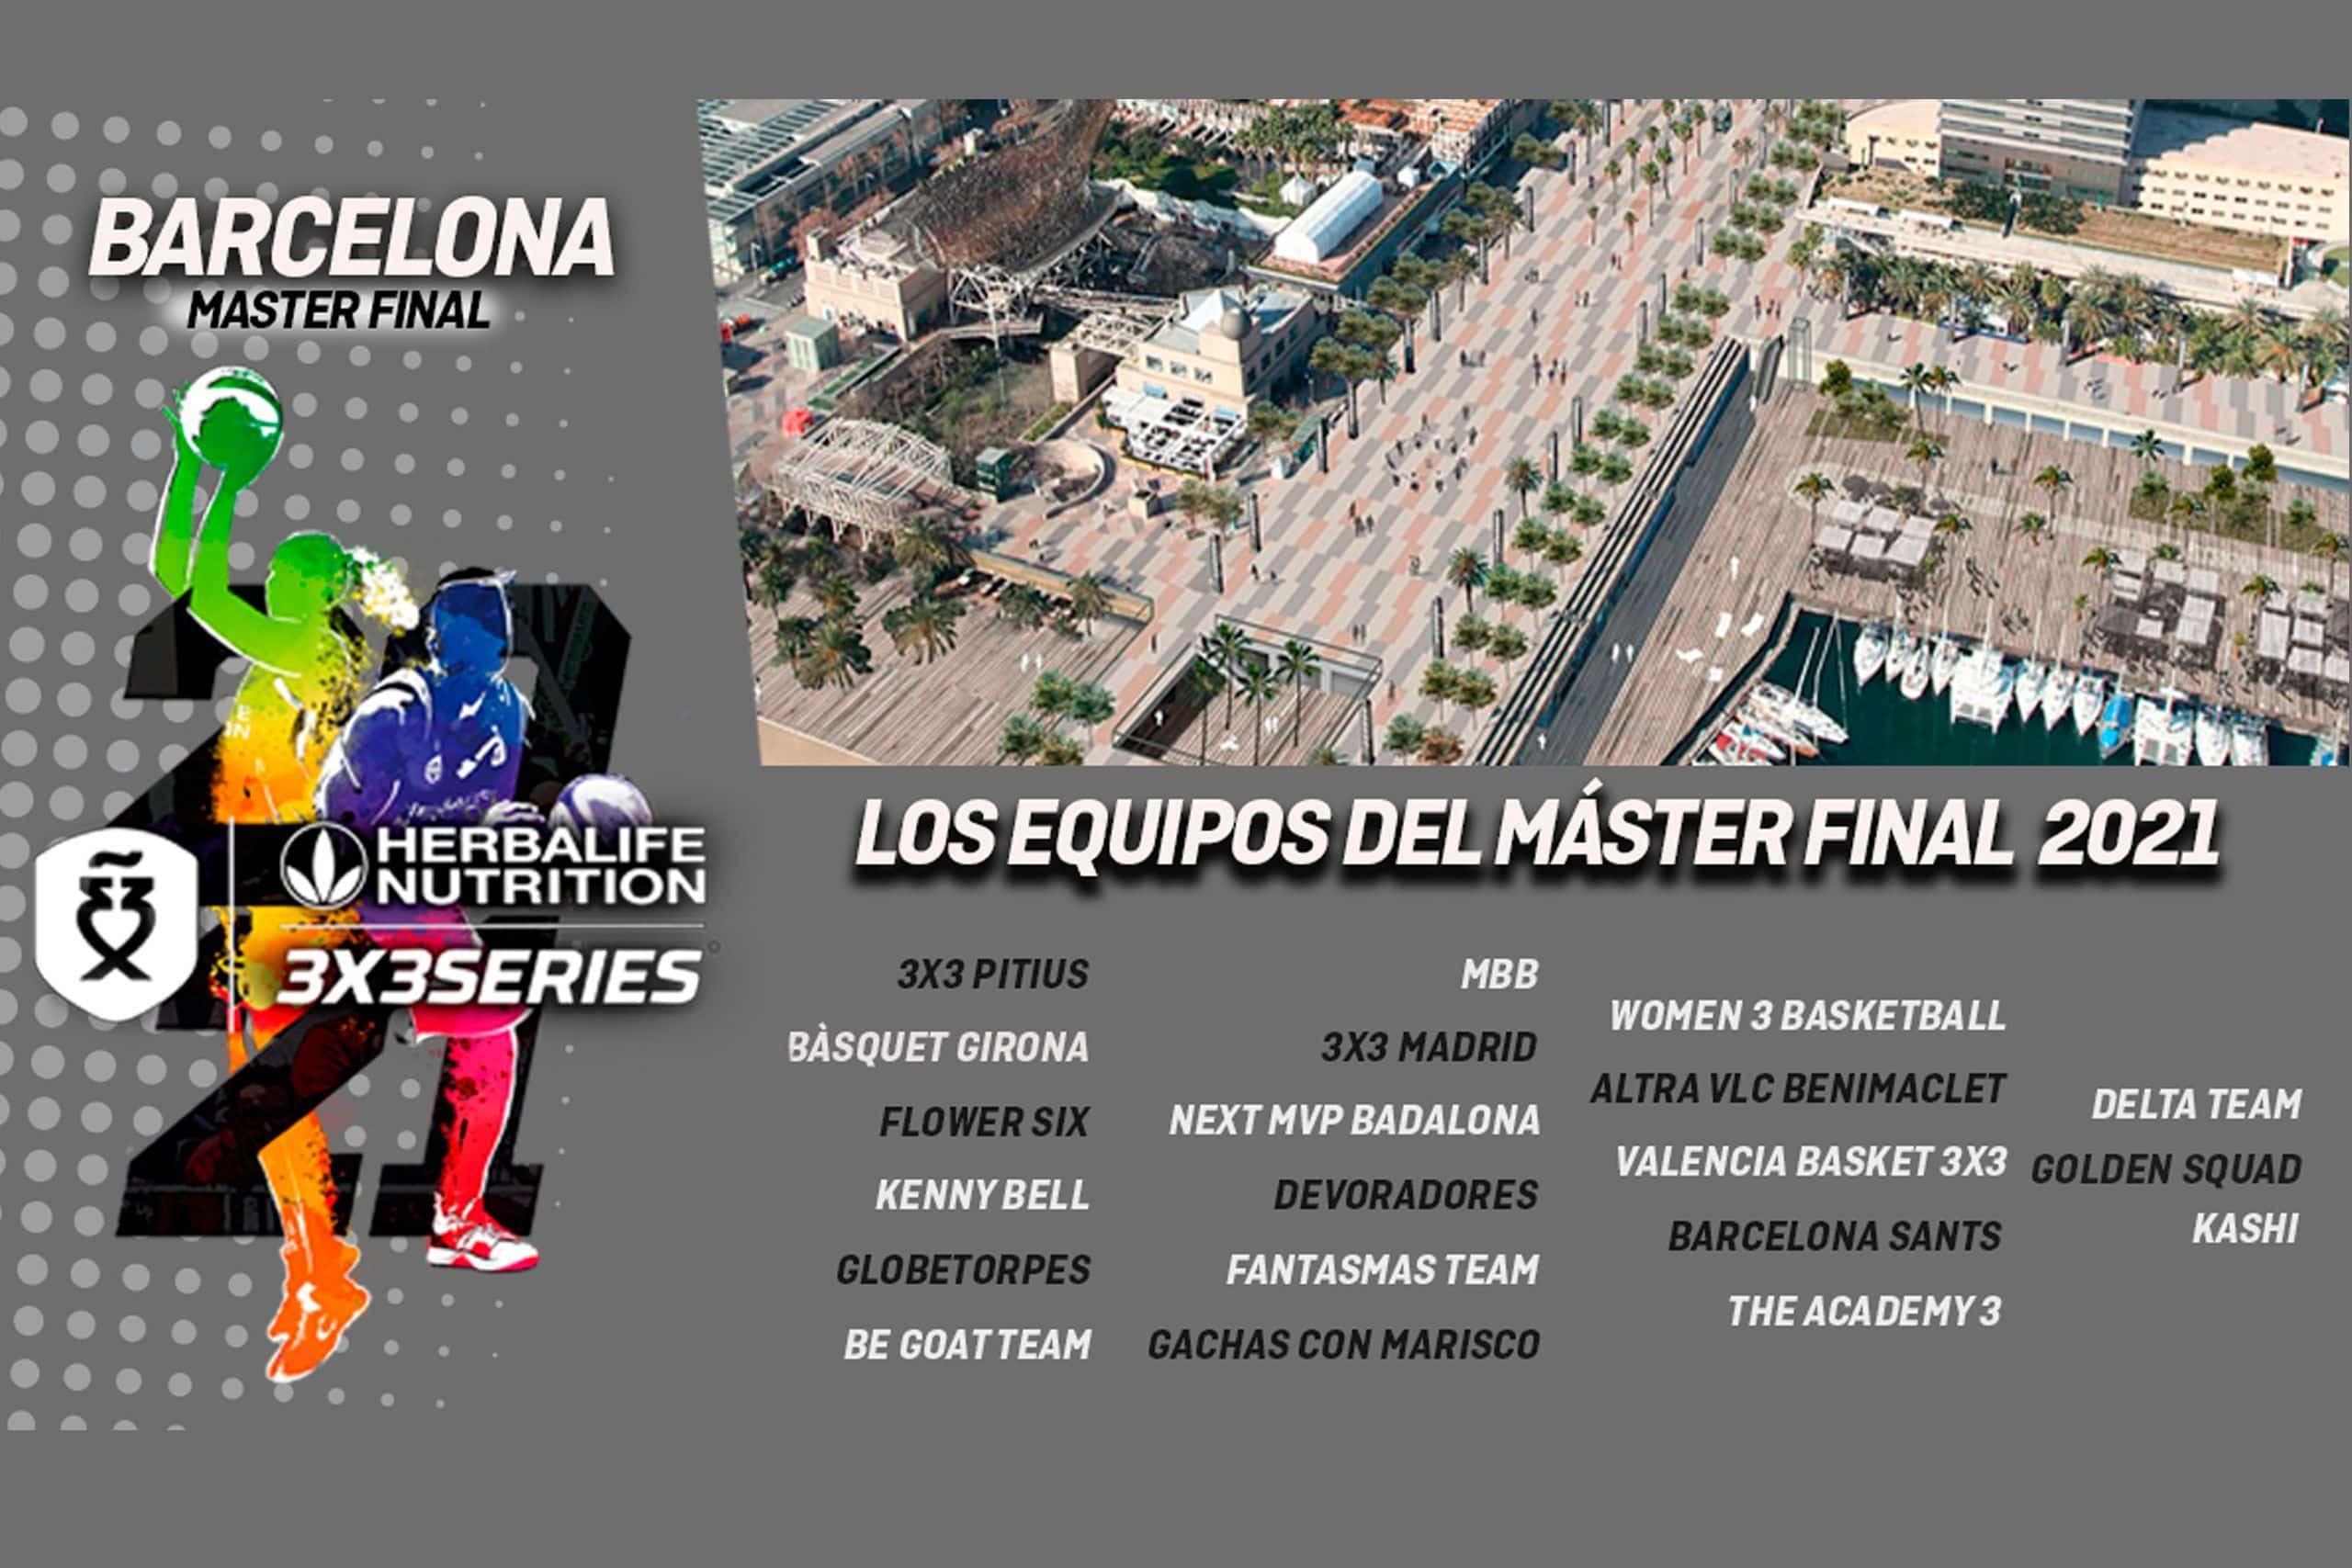 Equipos master final barcelona 3x3 madison